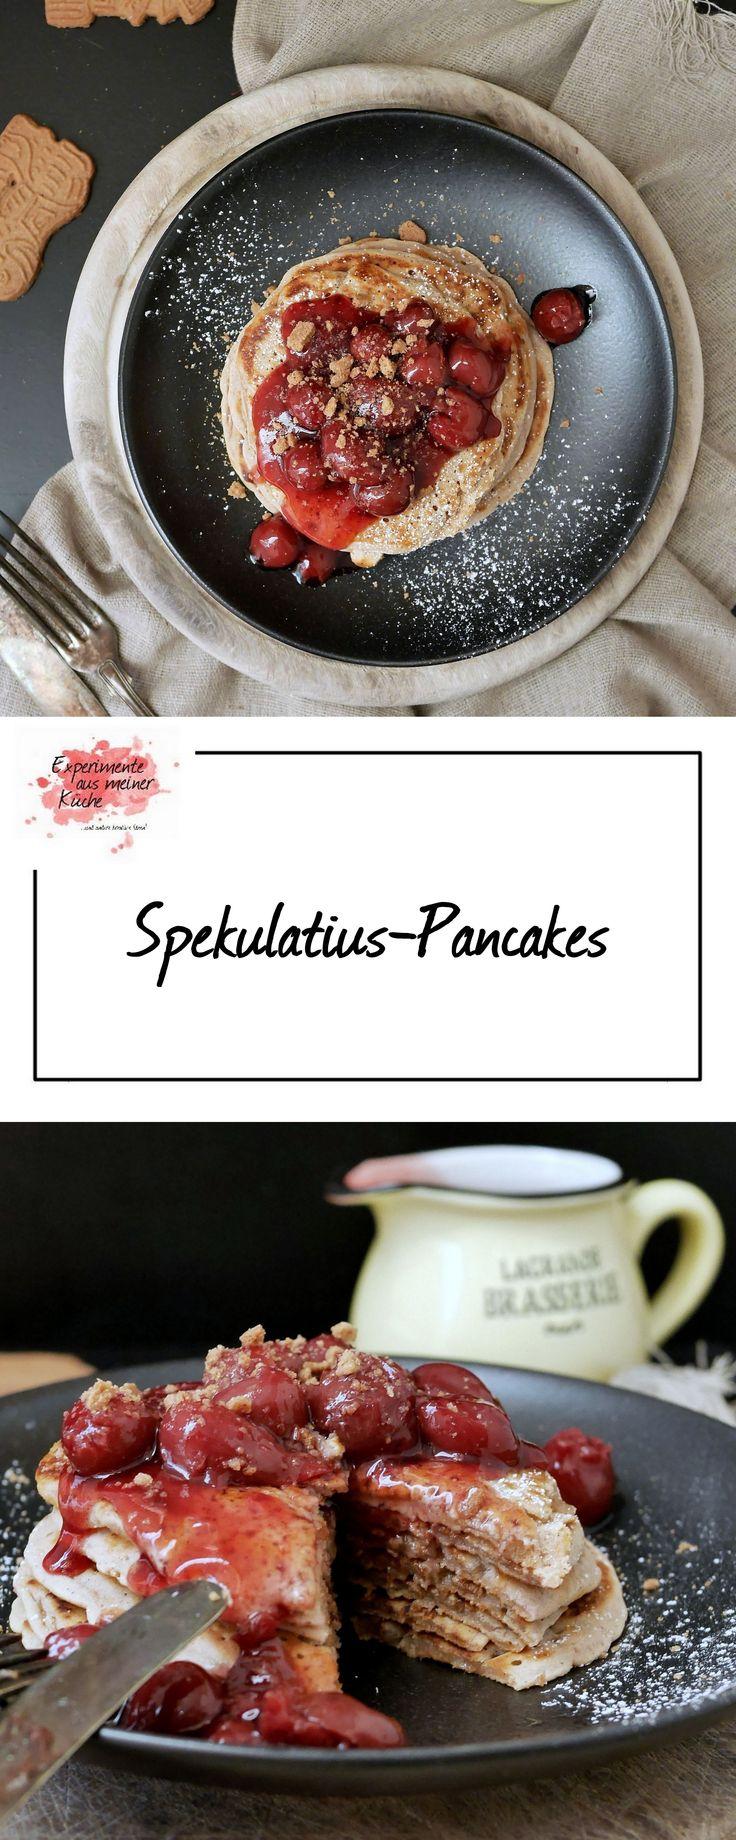 Spekulatius-Pancakes   Rezept   Weihnachten